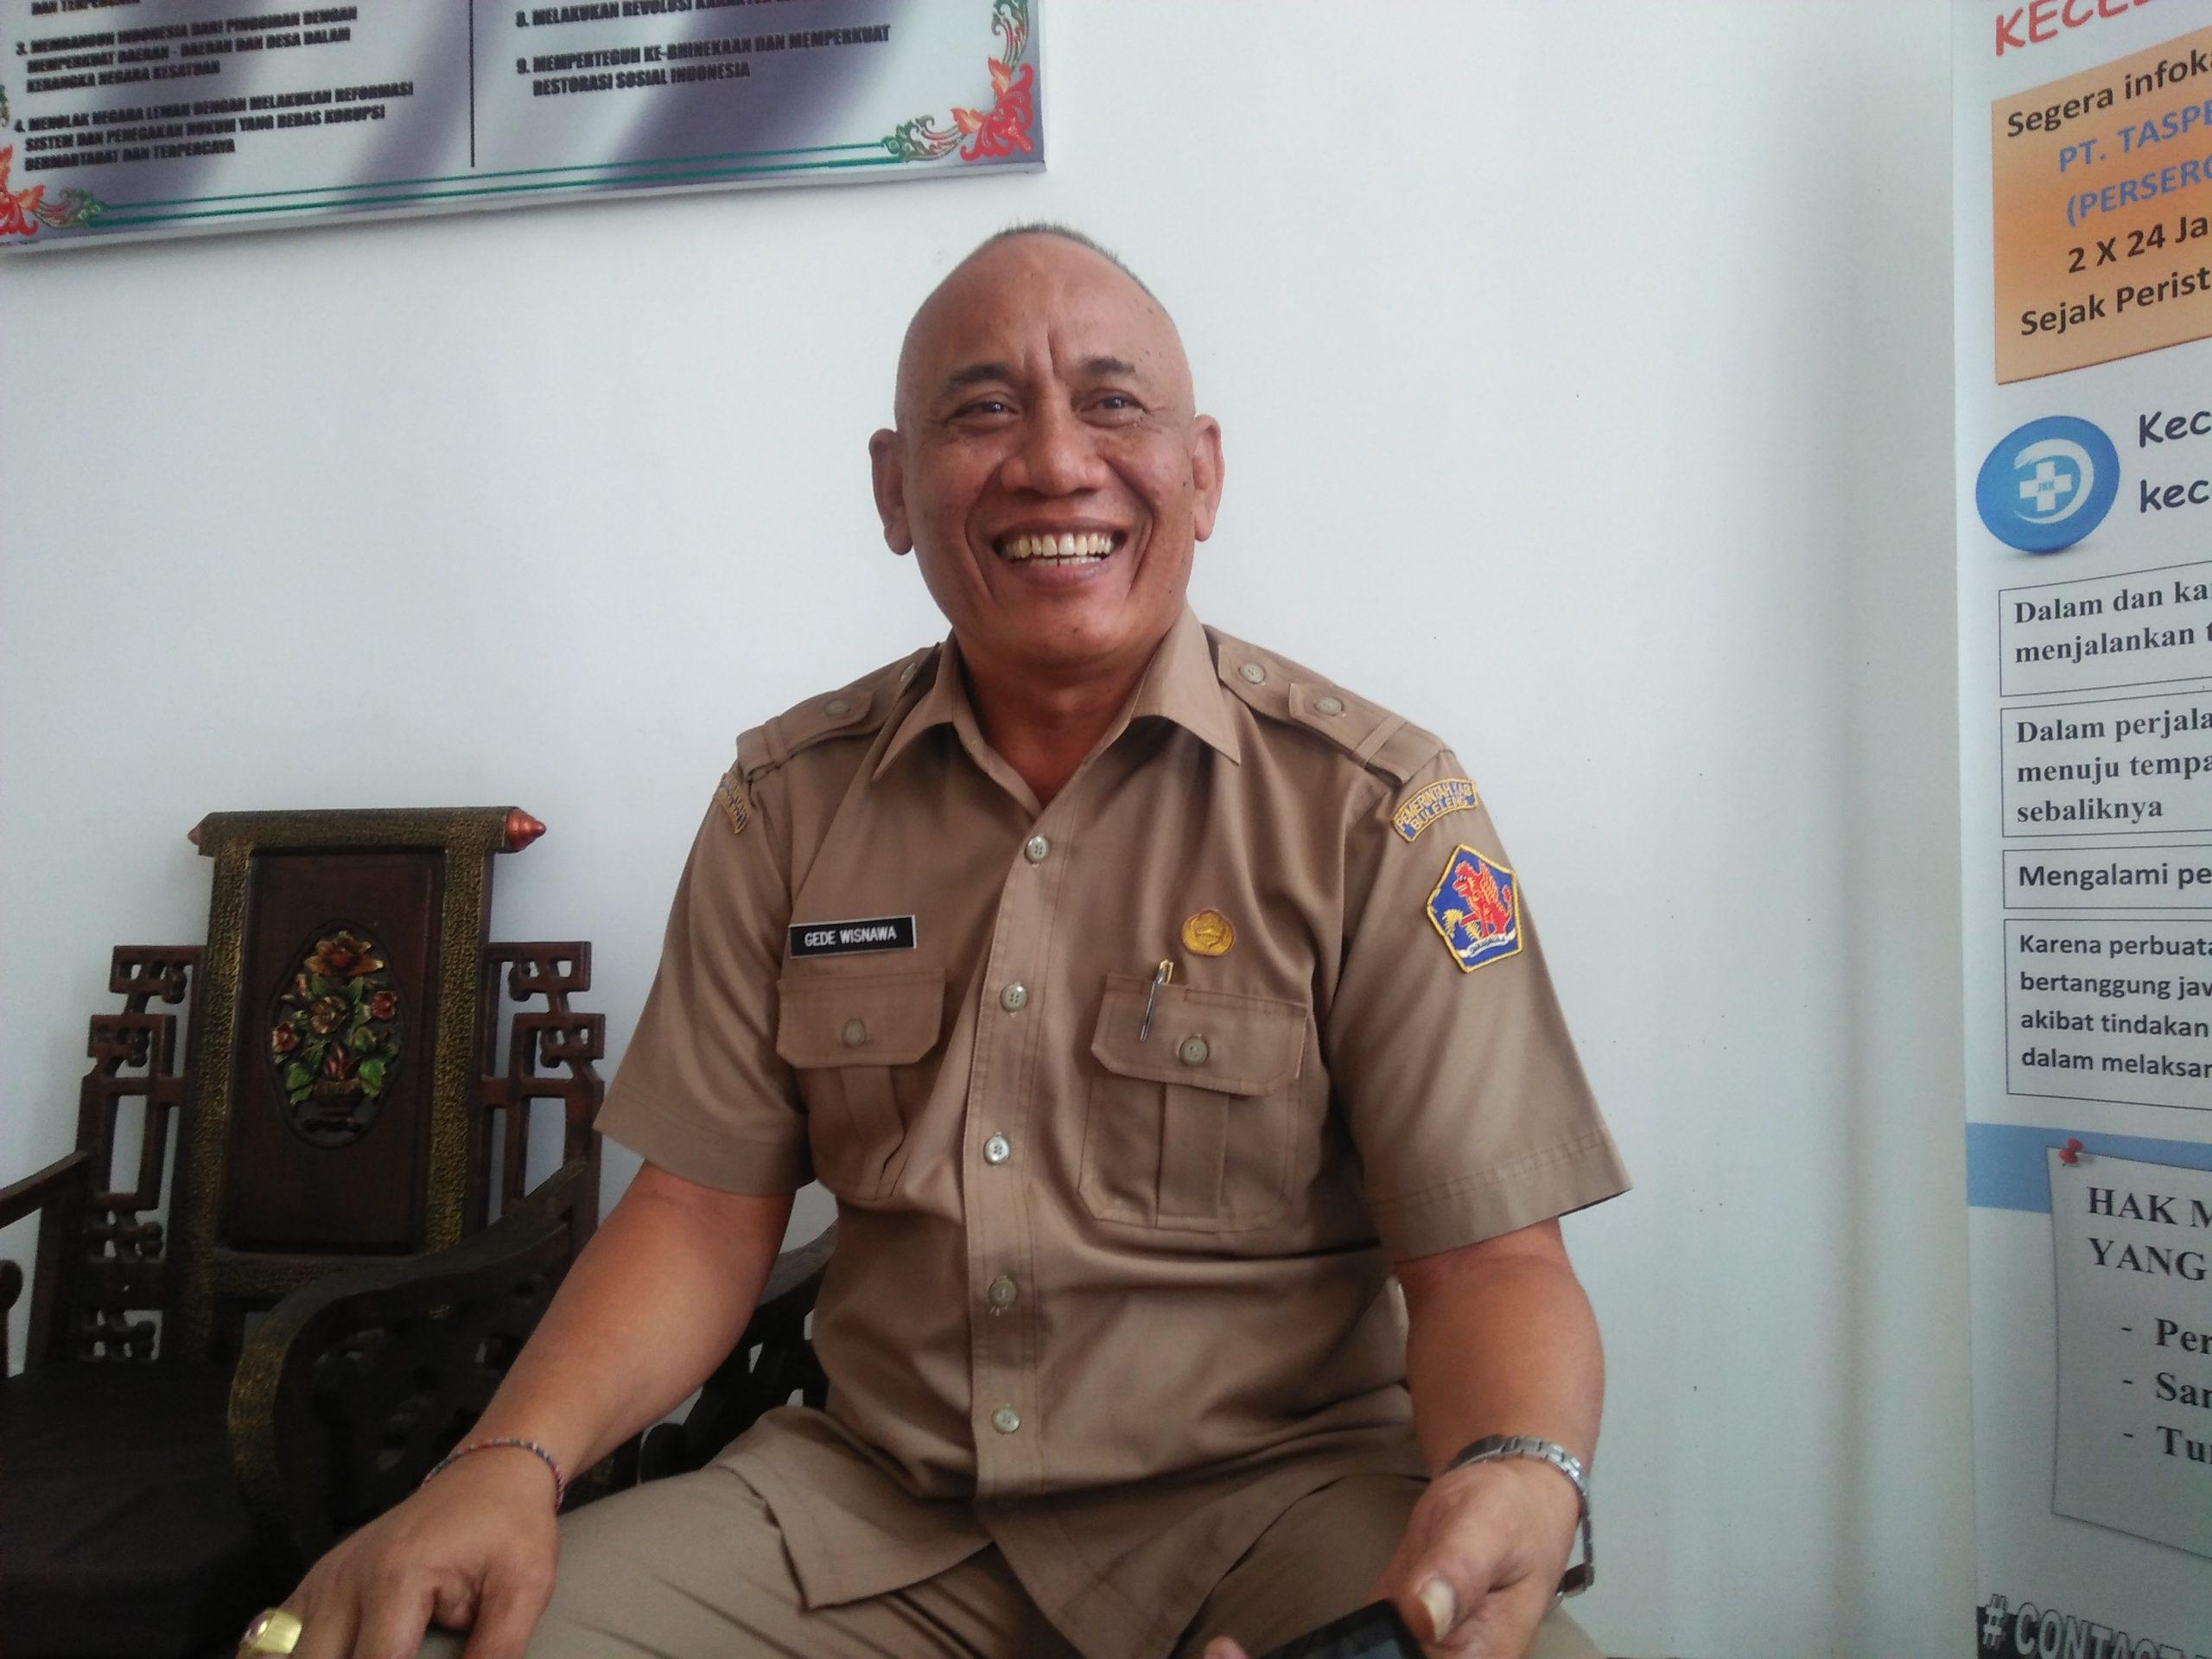 KEPALA BKPSDM Buleleng, Gede Wisnawa. Foto: ist